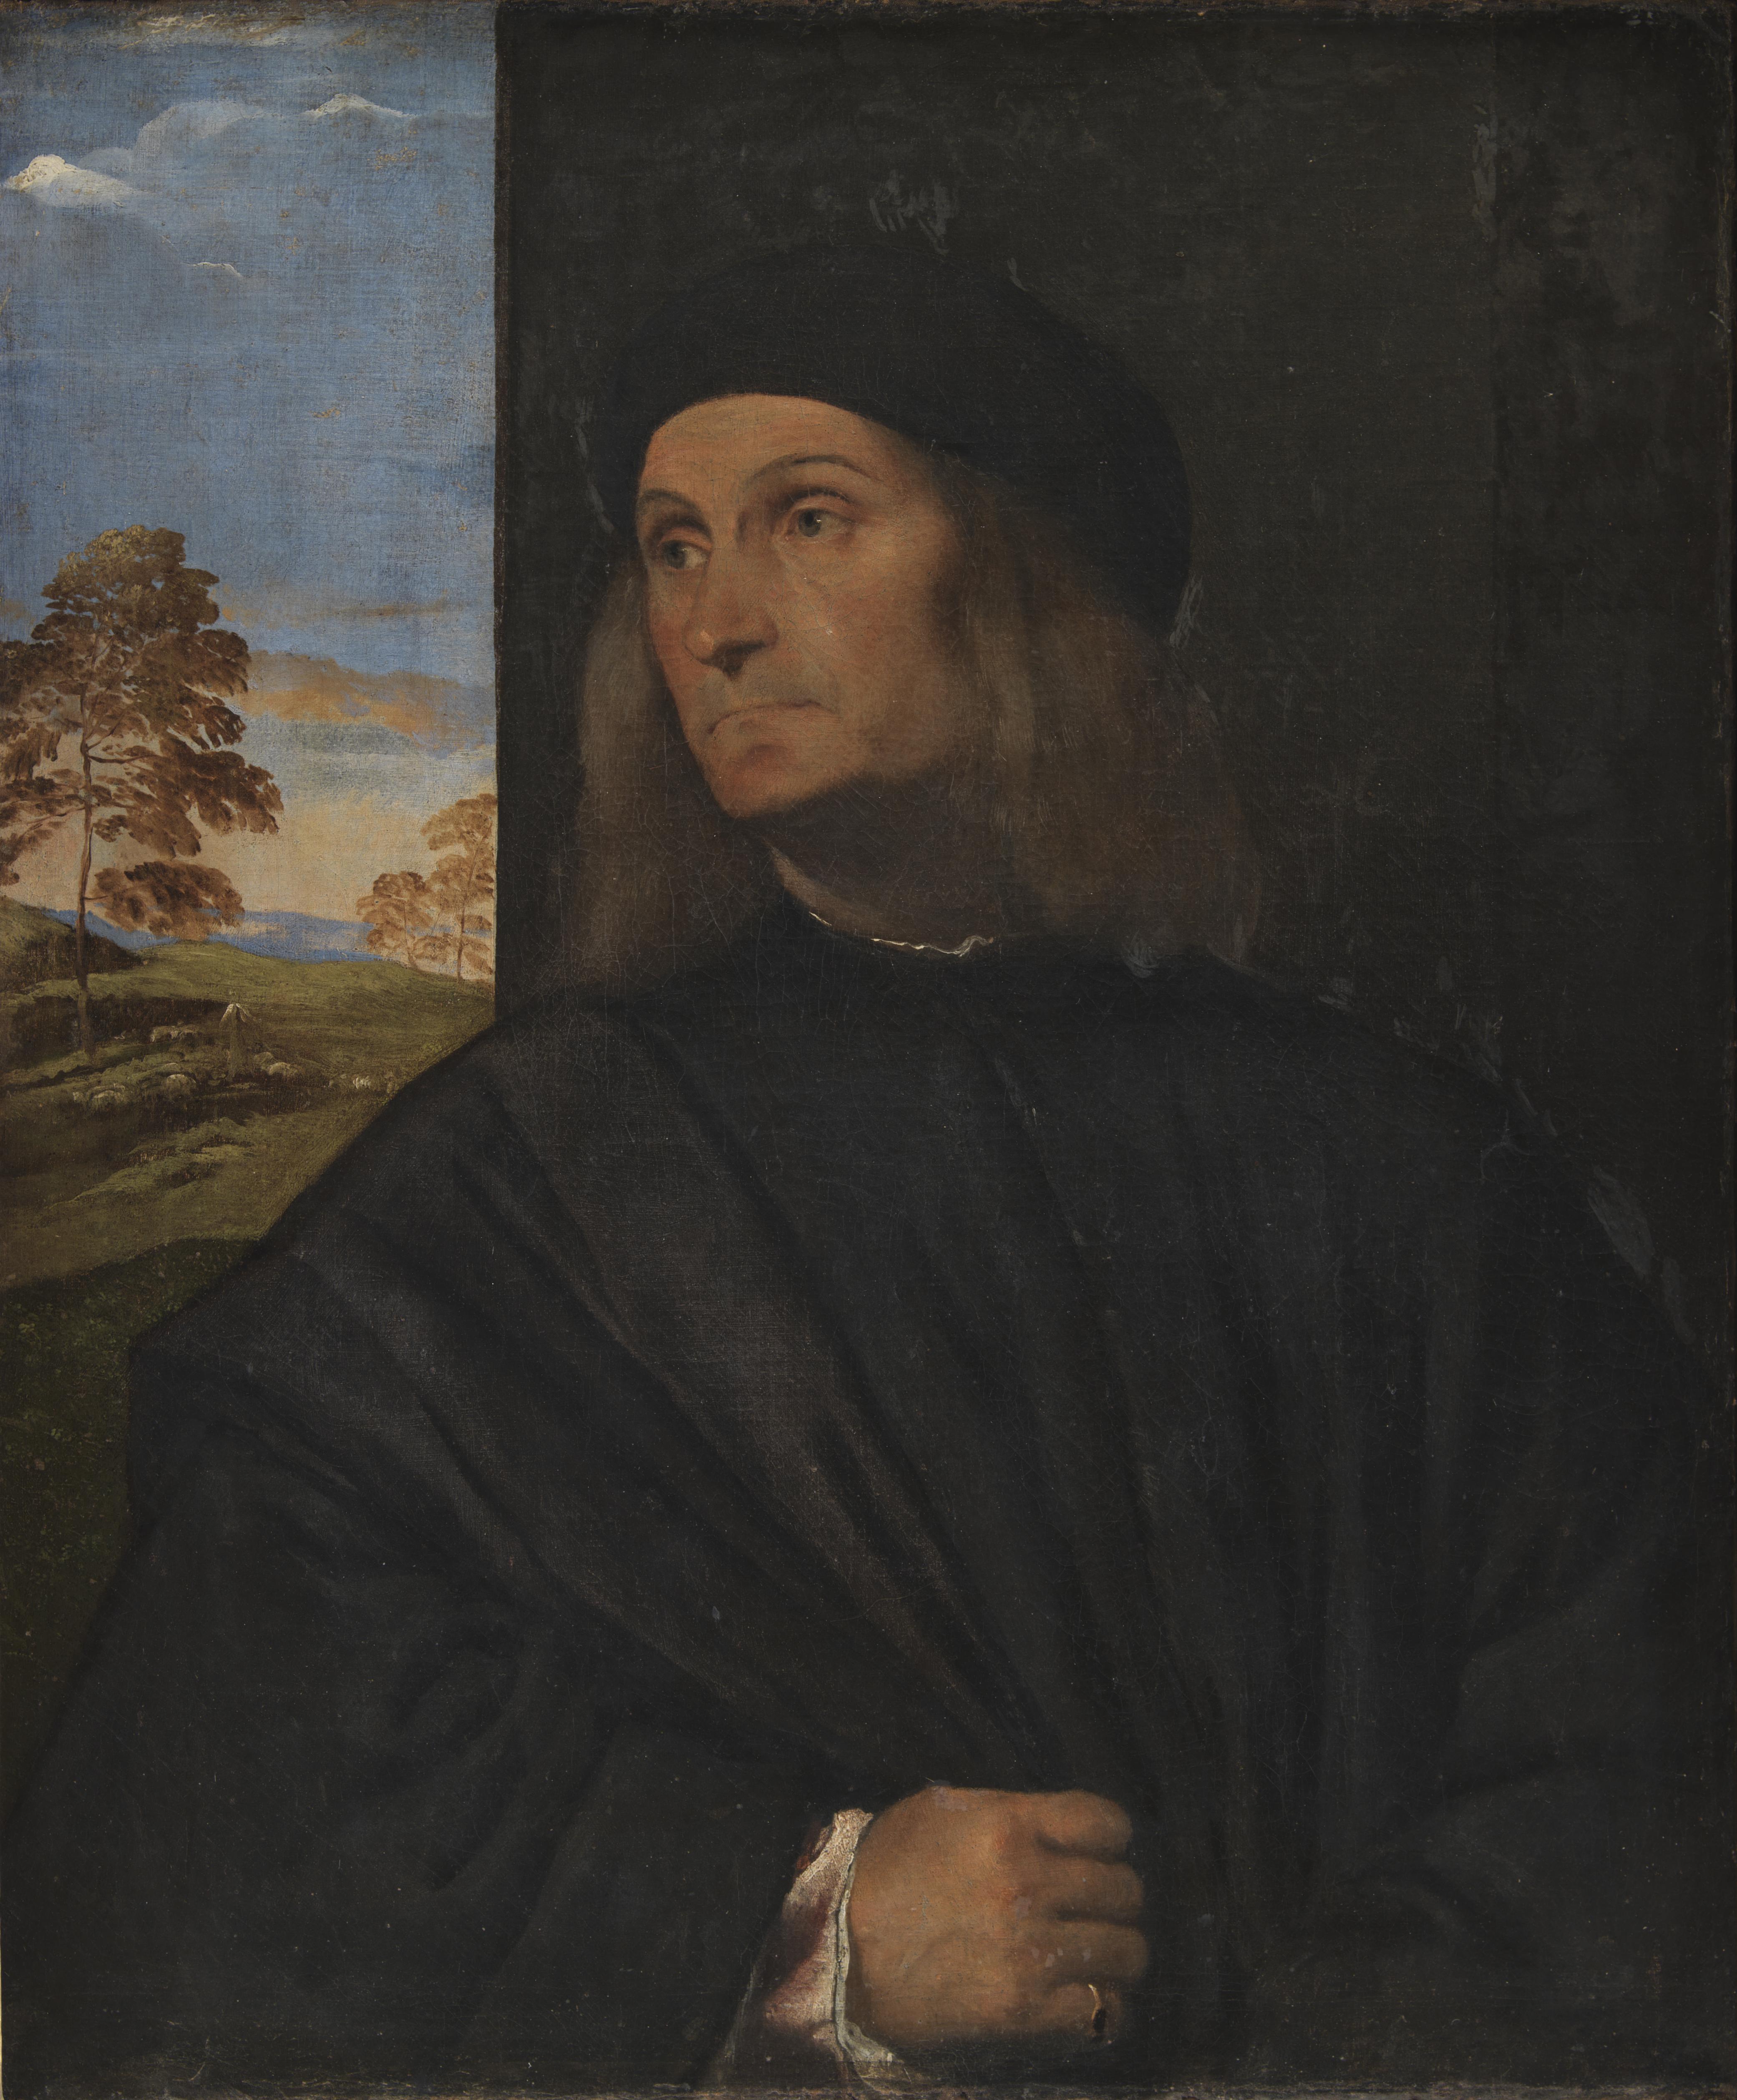 Tiziano Vecellio (1480-1576), Portrait of the Venetian Painter Giovanni Bellini?, 1511-12. dep15., Man, Painting, People, Portait, HQ Photo